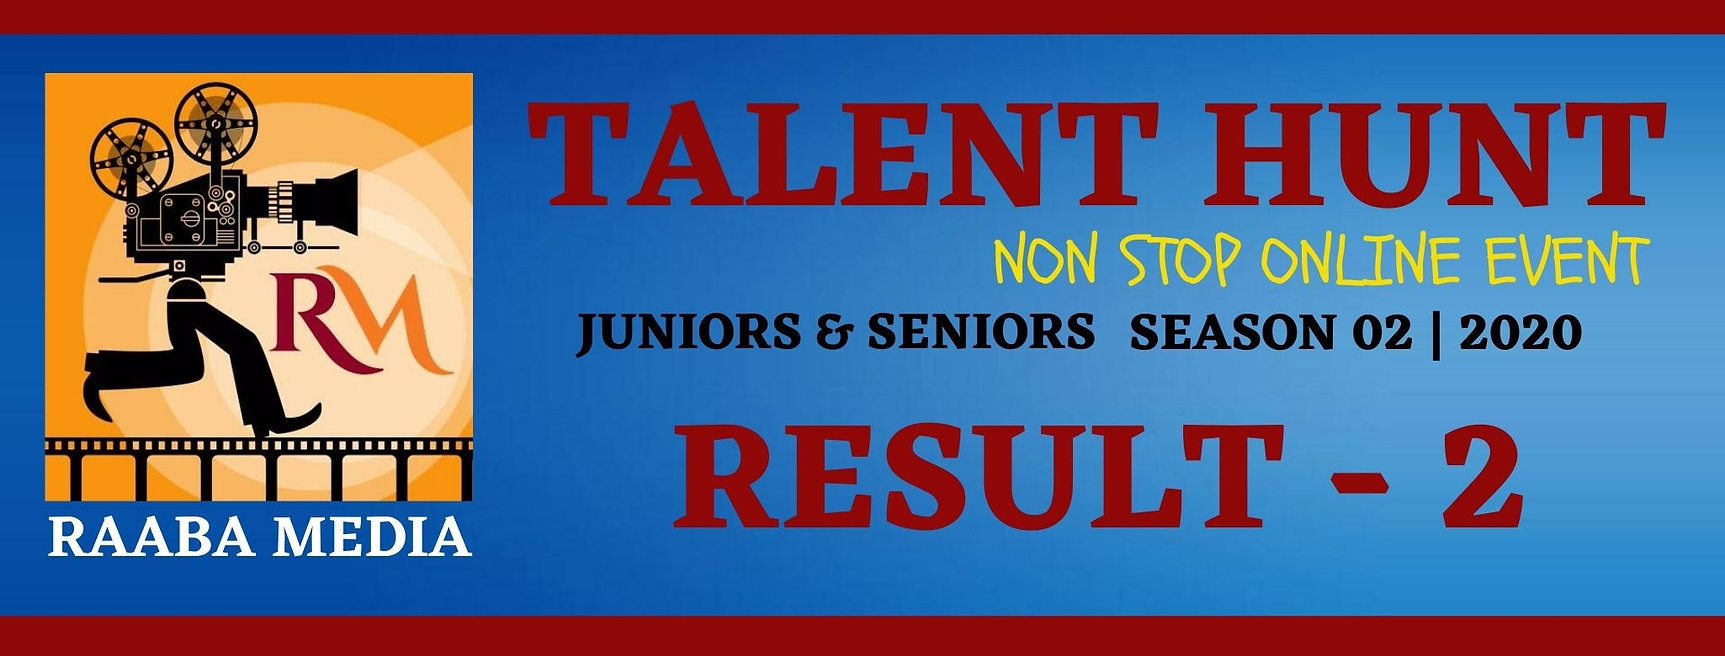 talent hunt non stop online event (3).jp